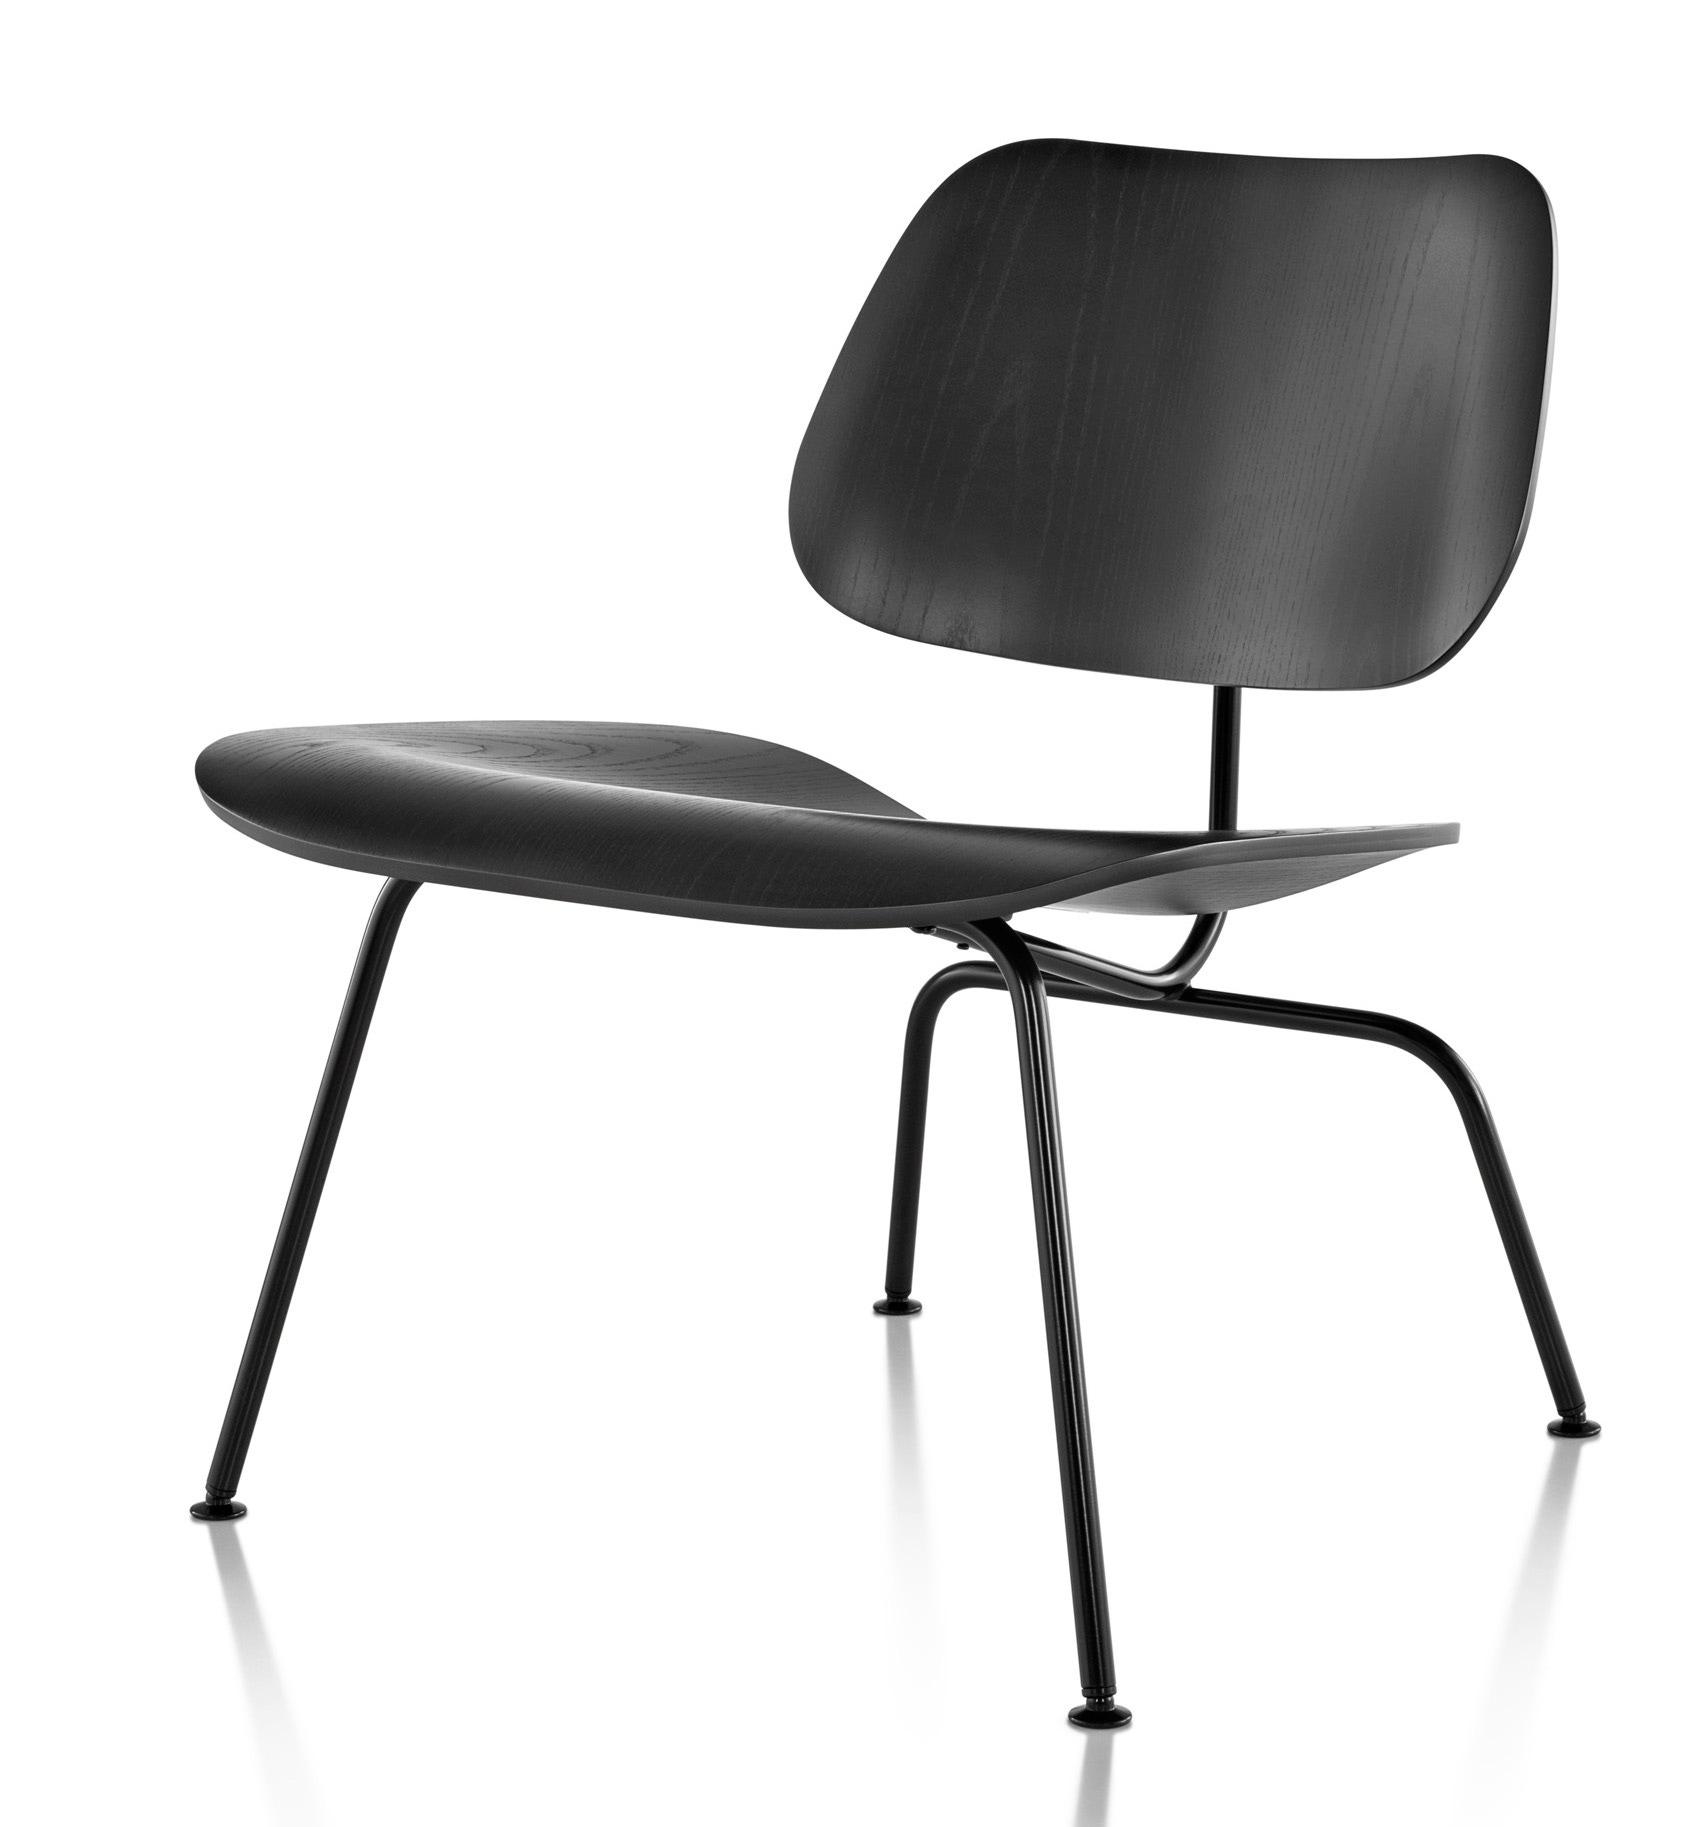 herman miller eames molded plywood lounge chair metal legs gr shop canada. Black Bedroom Furniture Sets. Home Design Ideas